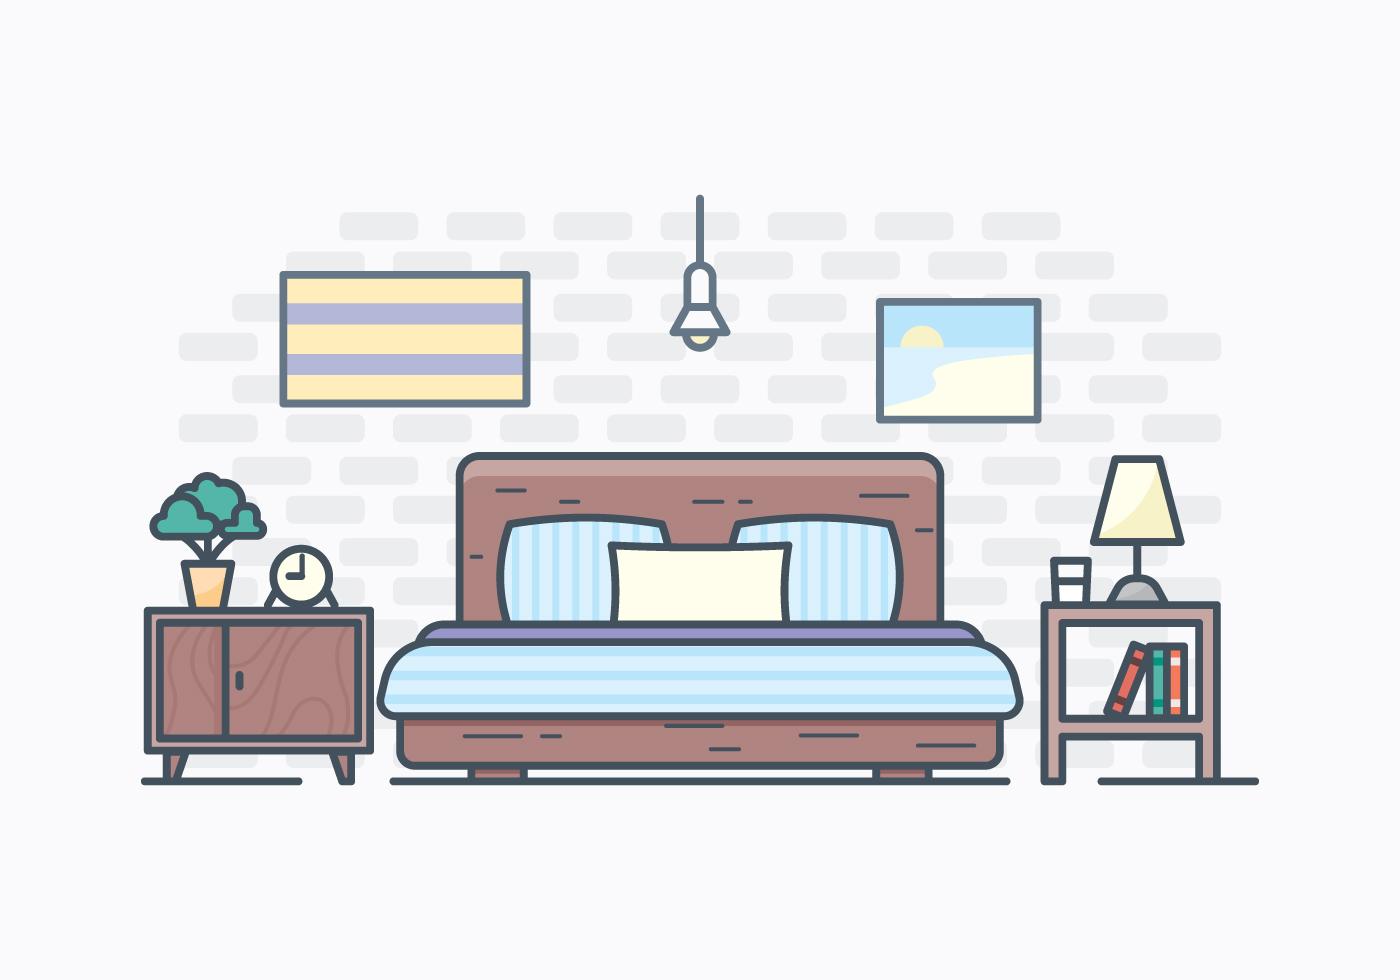 free simple bedroom illustration  download free vectors